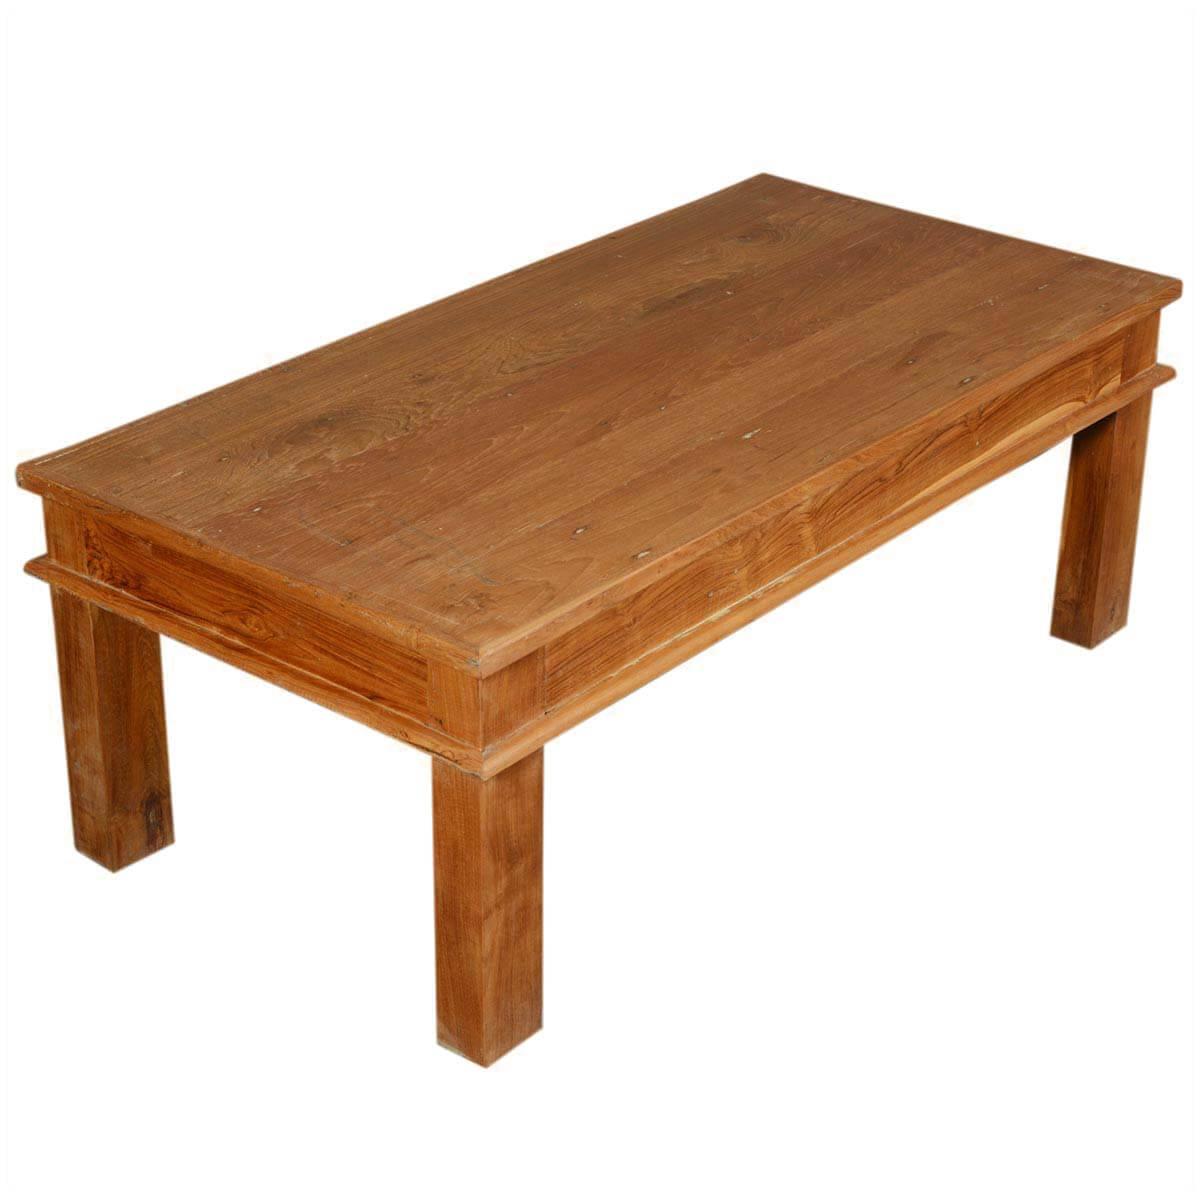 "48"" Solid Teak Wood Danish Rustic Coffee Table"